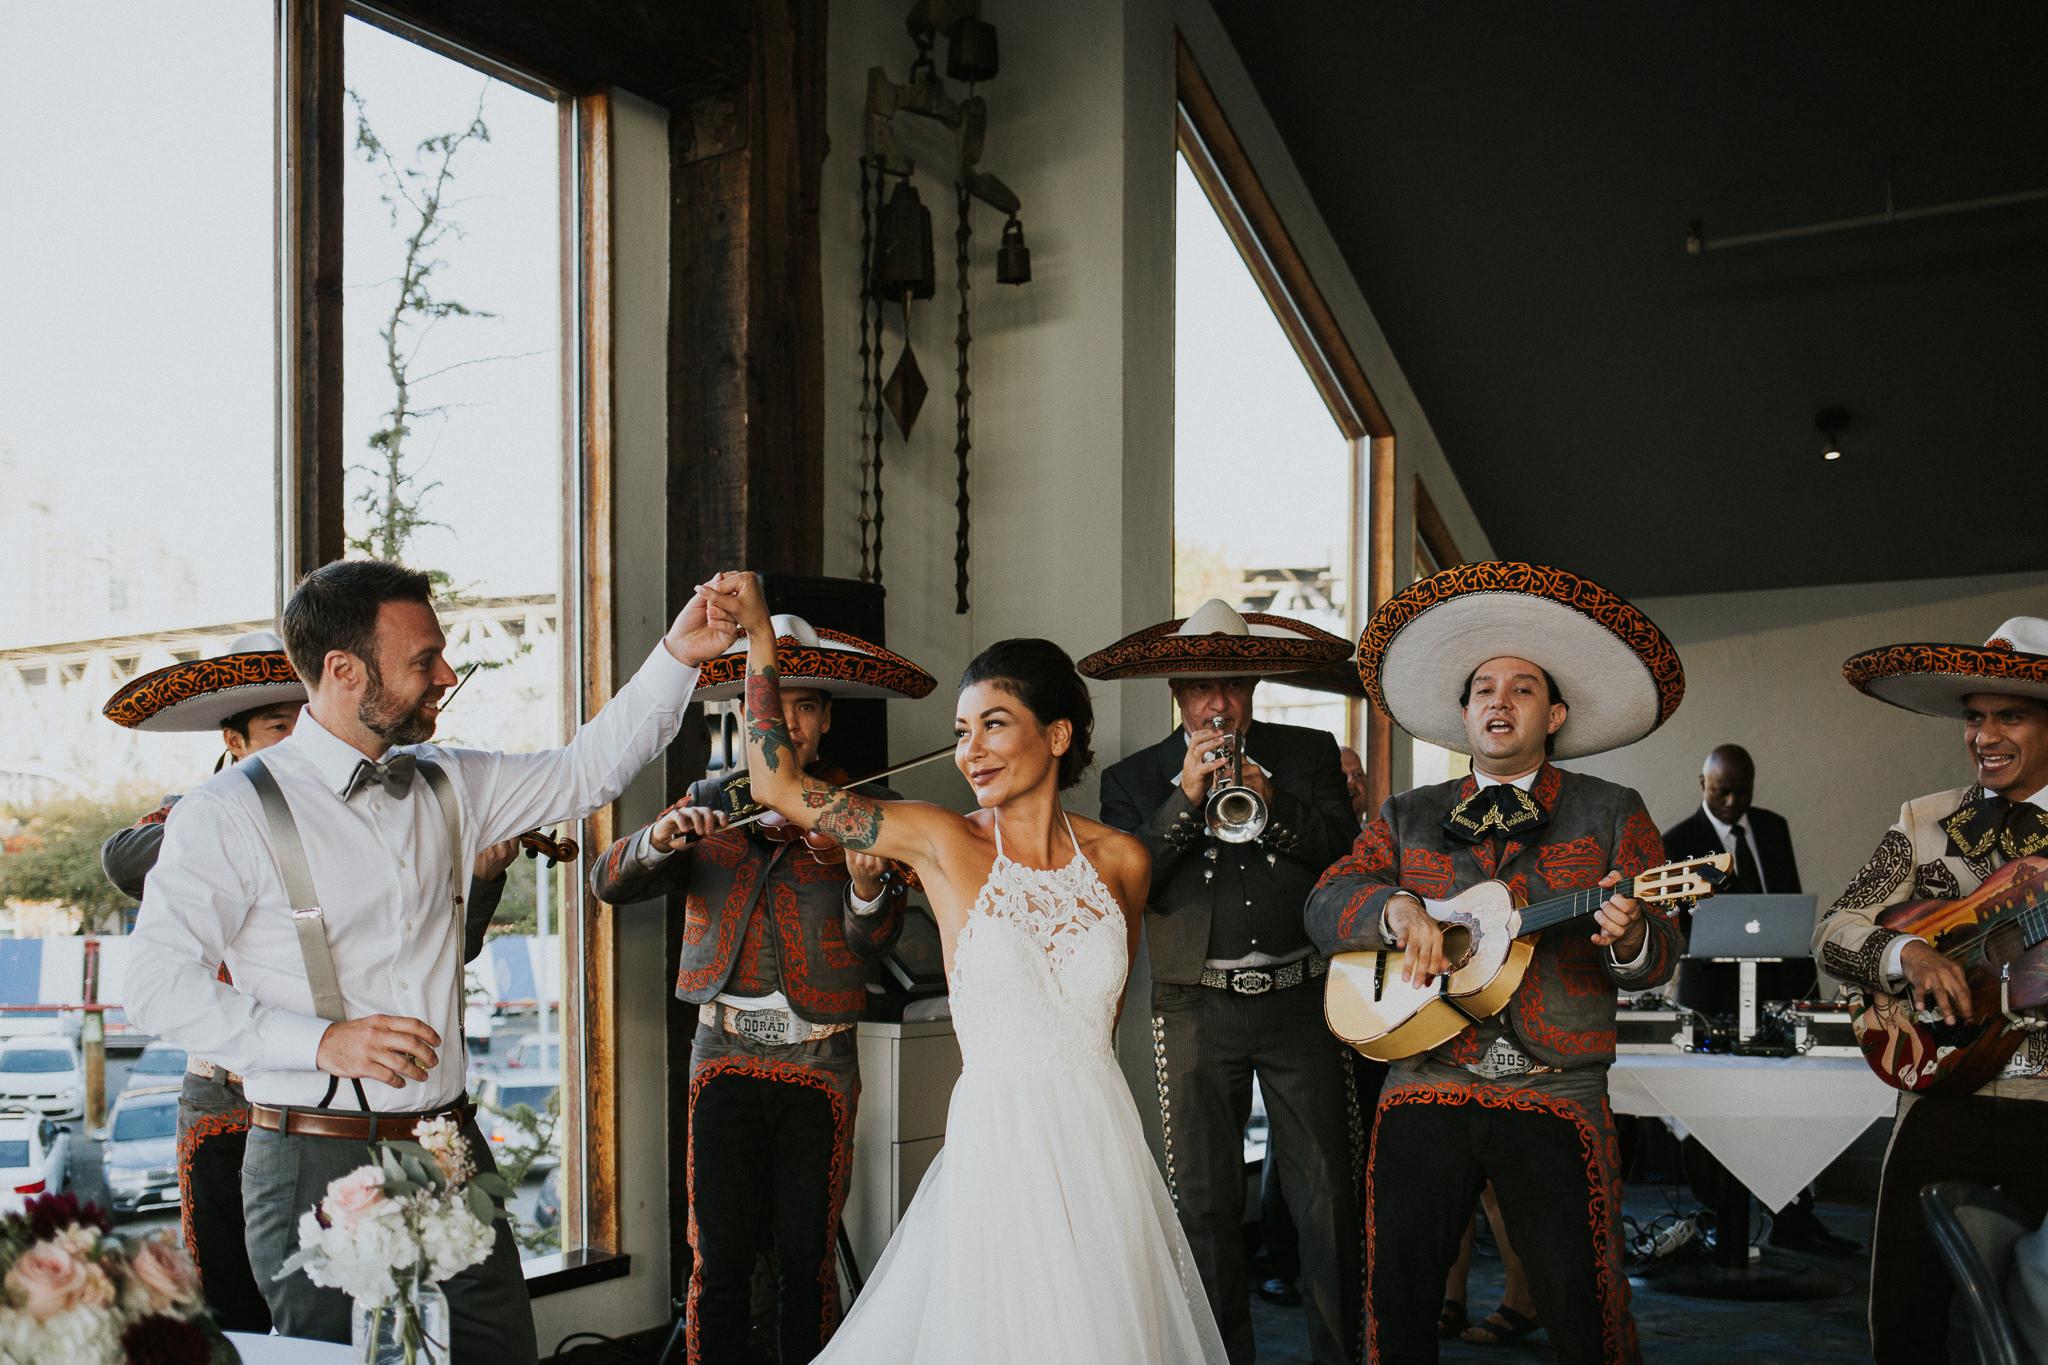 65-bridges-granville-island-vancouver-wedding-ayakopaddy-web-4279.jpg